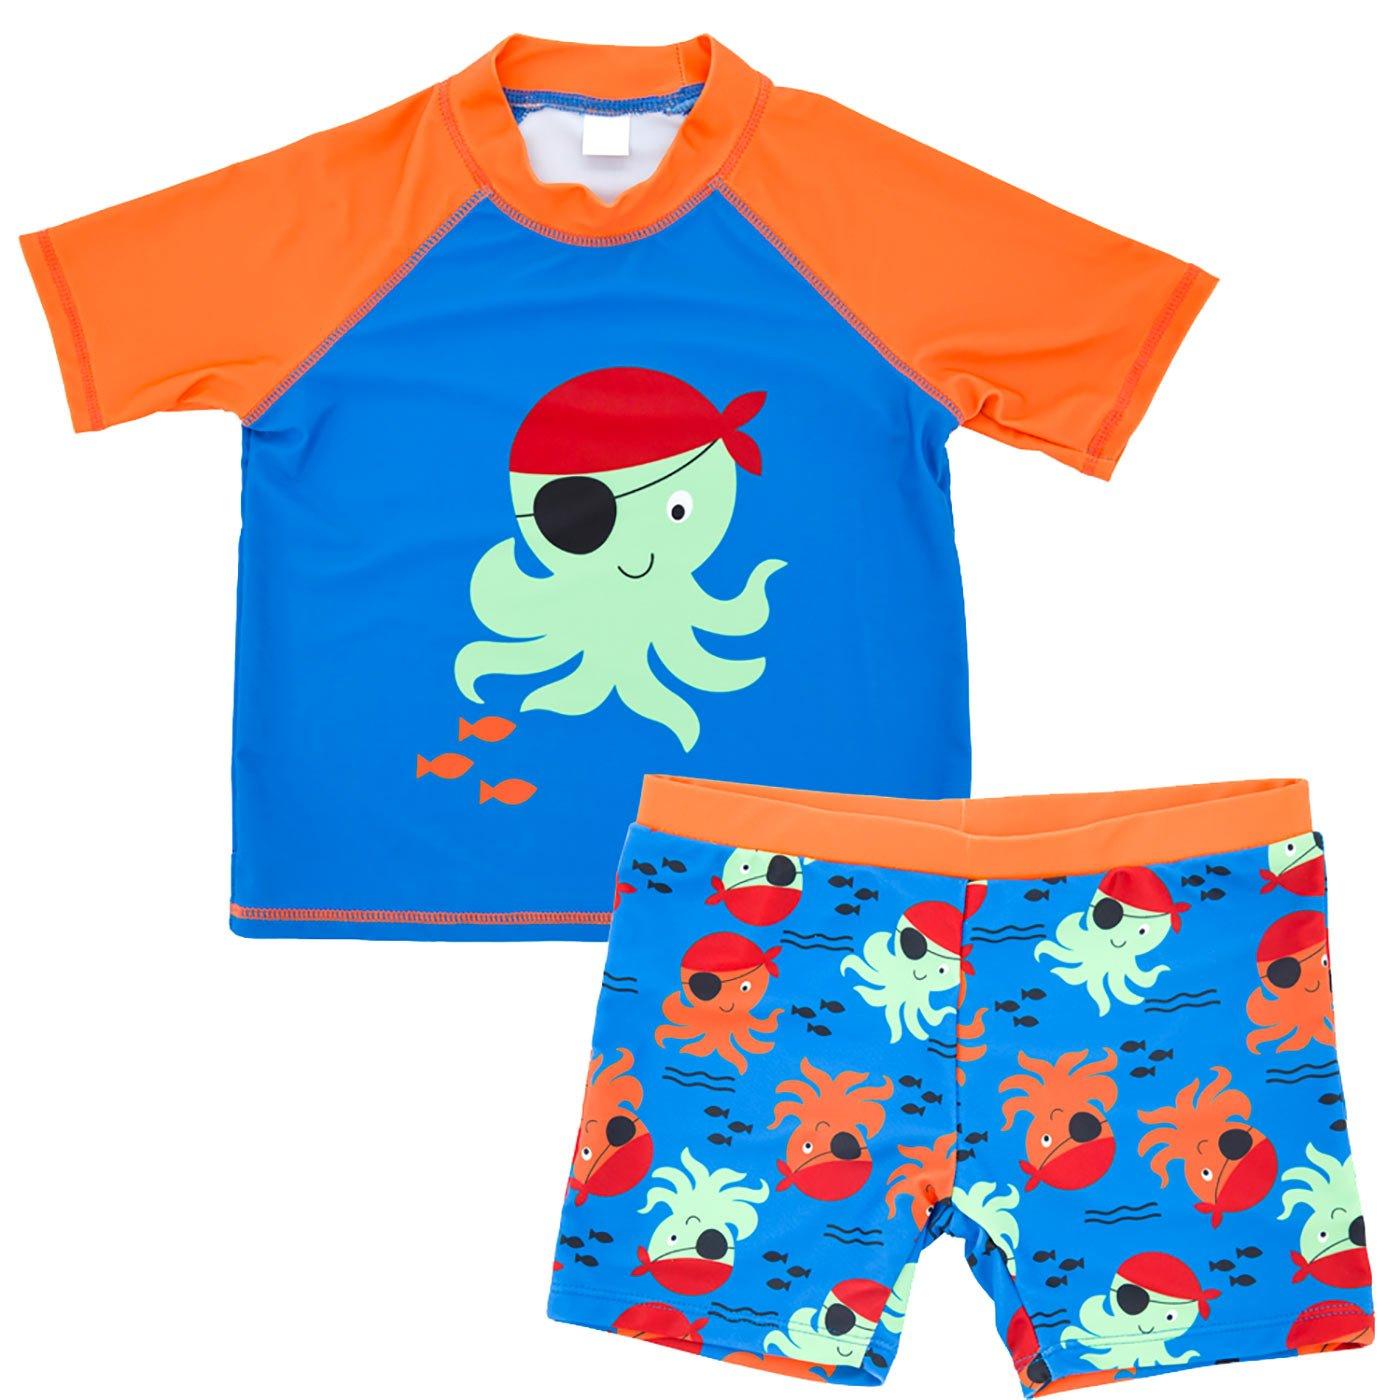 Baby Boys Rashguard Set 2-Piece Short Sleeve Swimwear with Sun Protection Kavkas